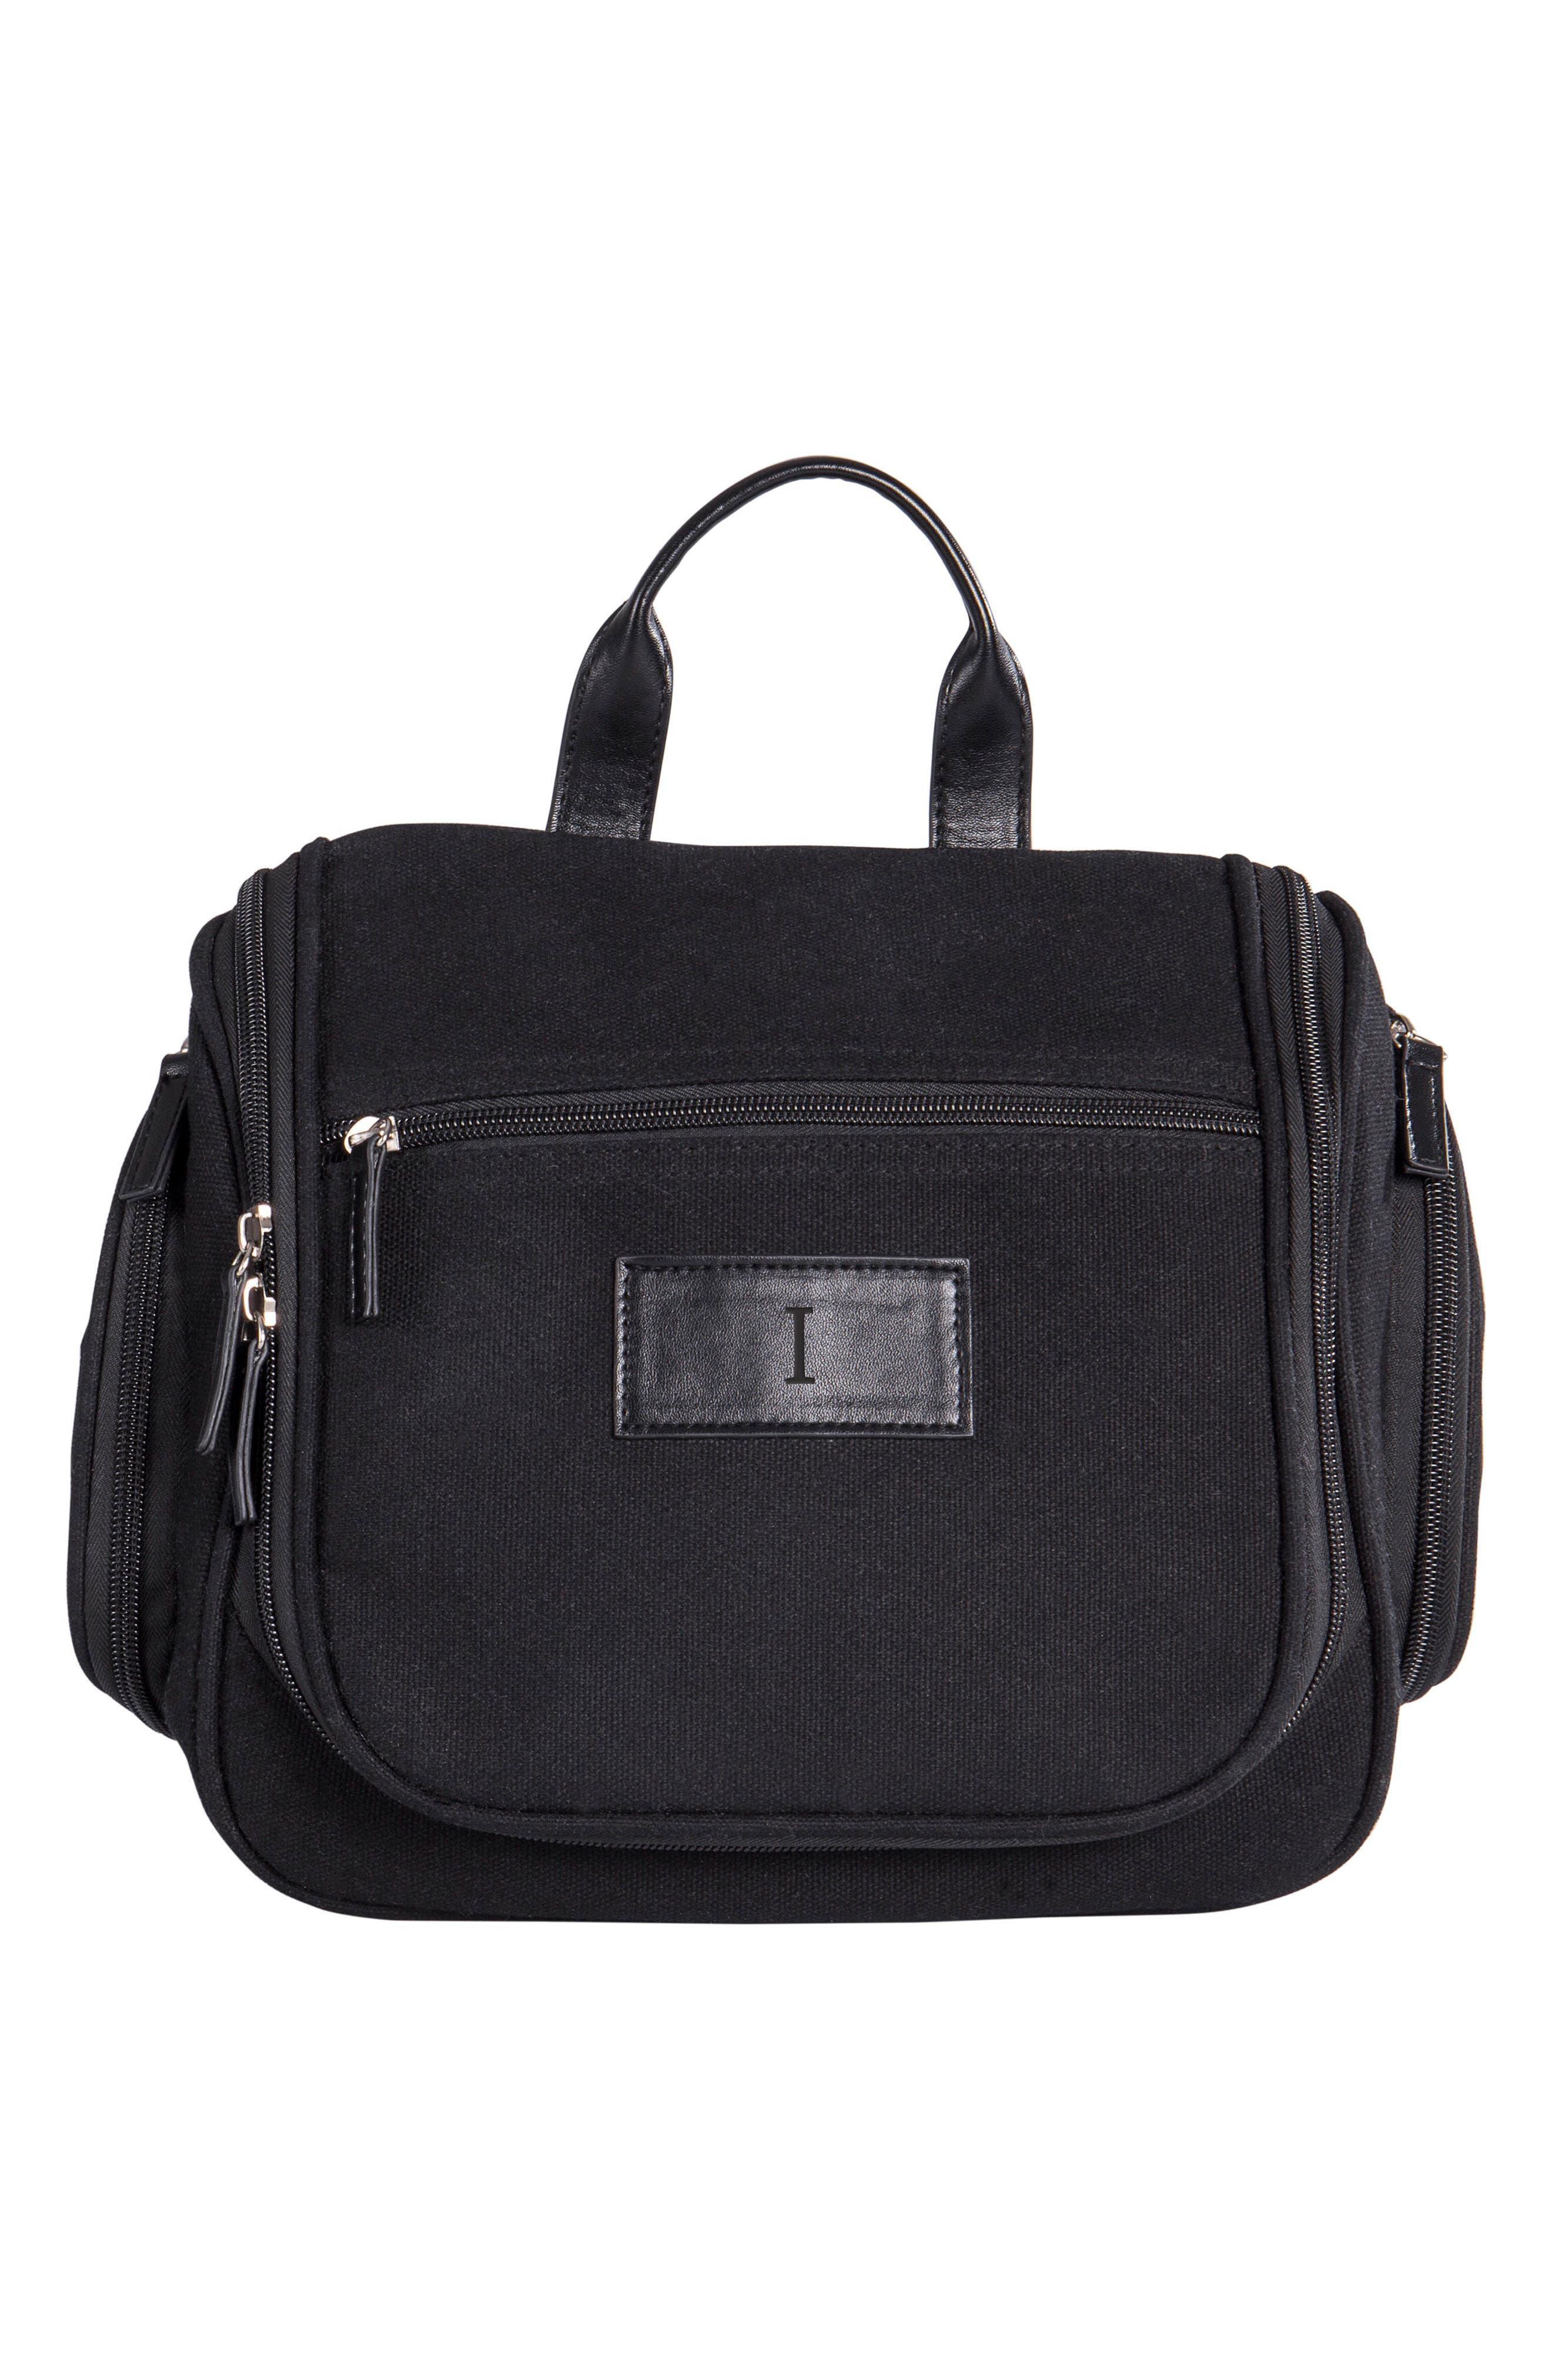 CATHY'S CONCEPTS Monogram Toiletry Bag, Main, color, BLACK-I